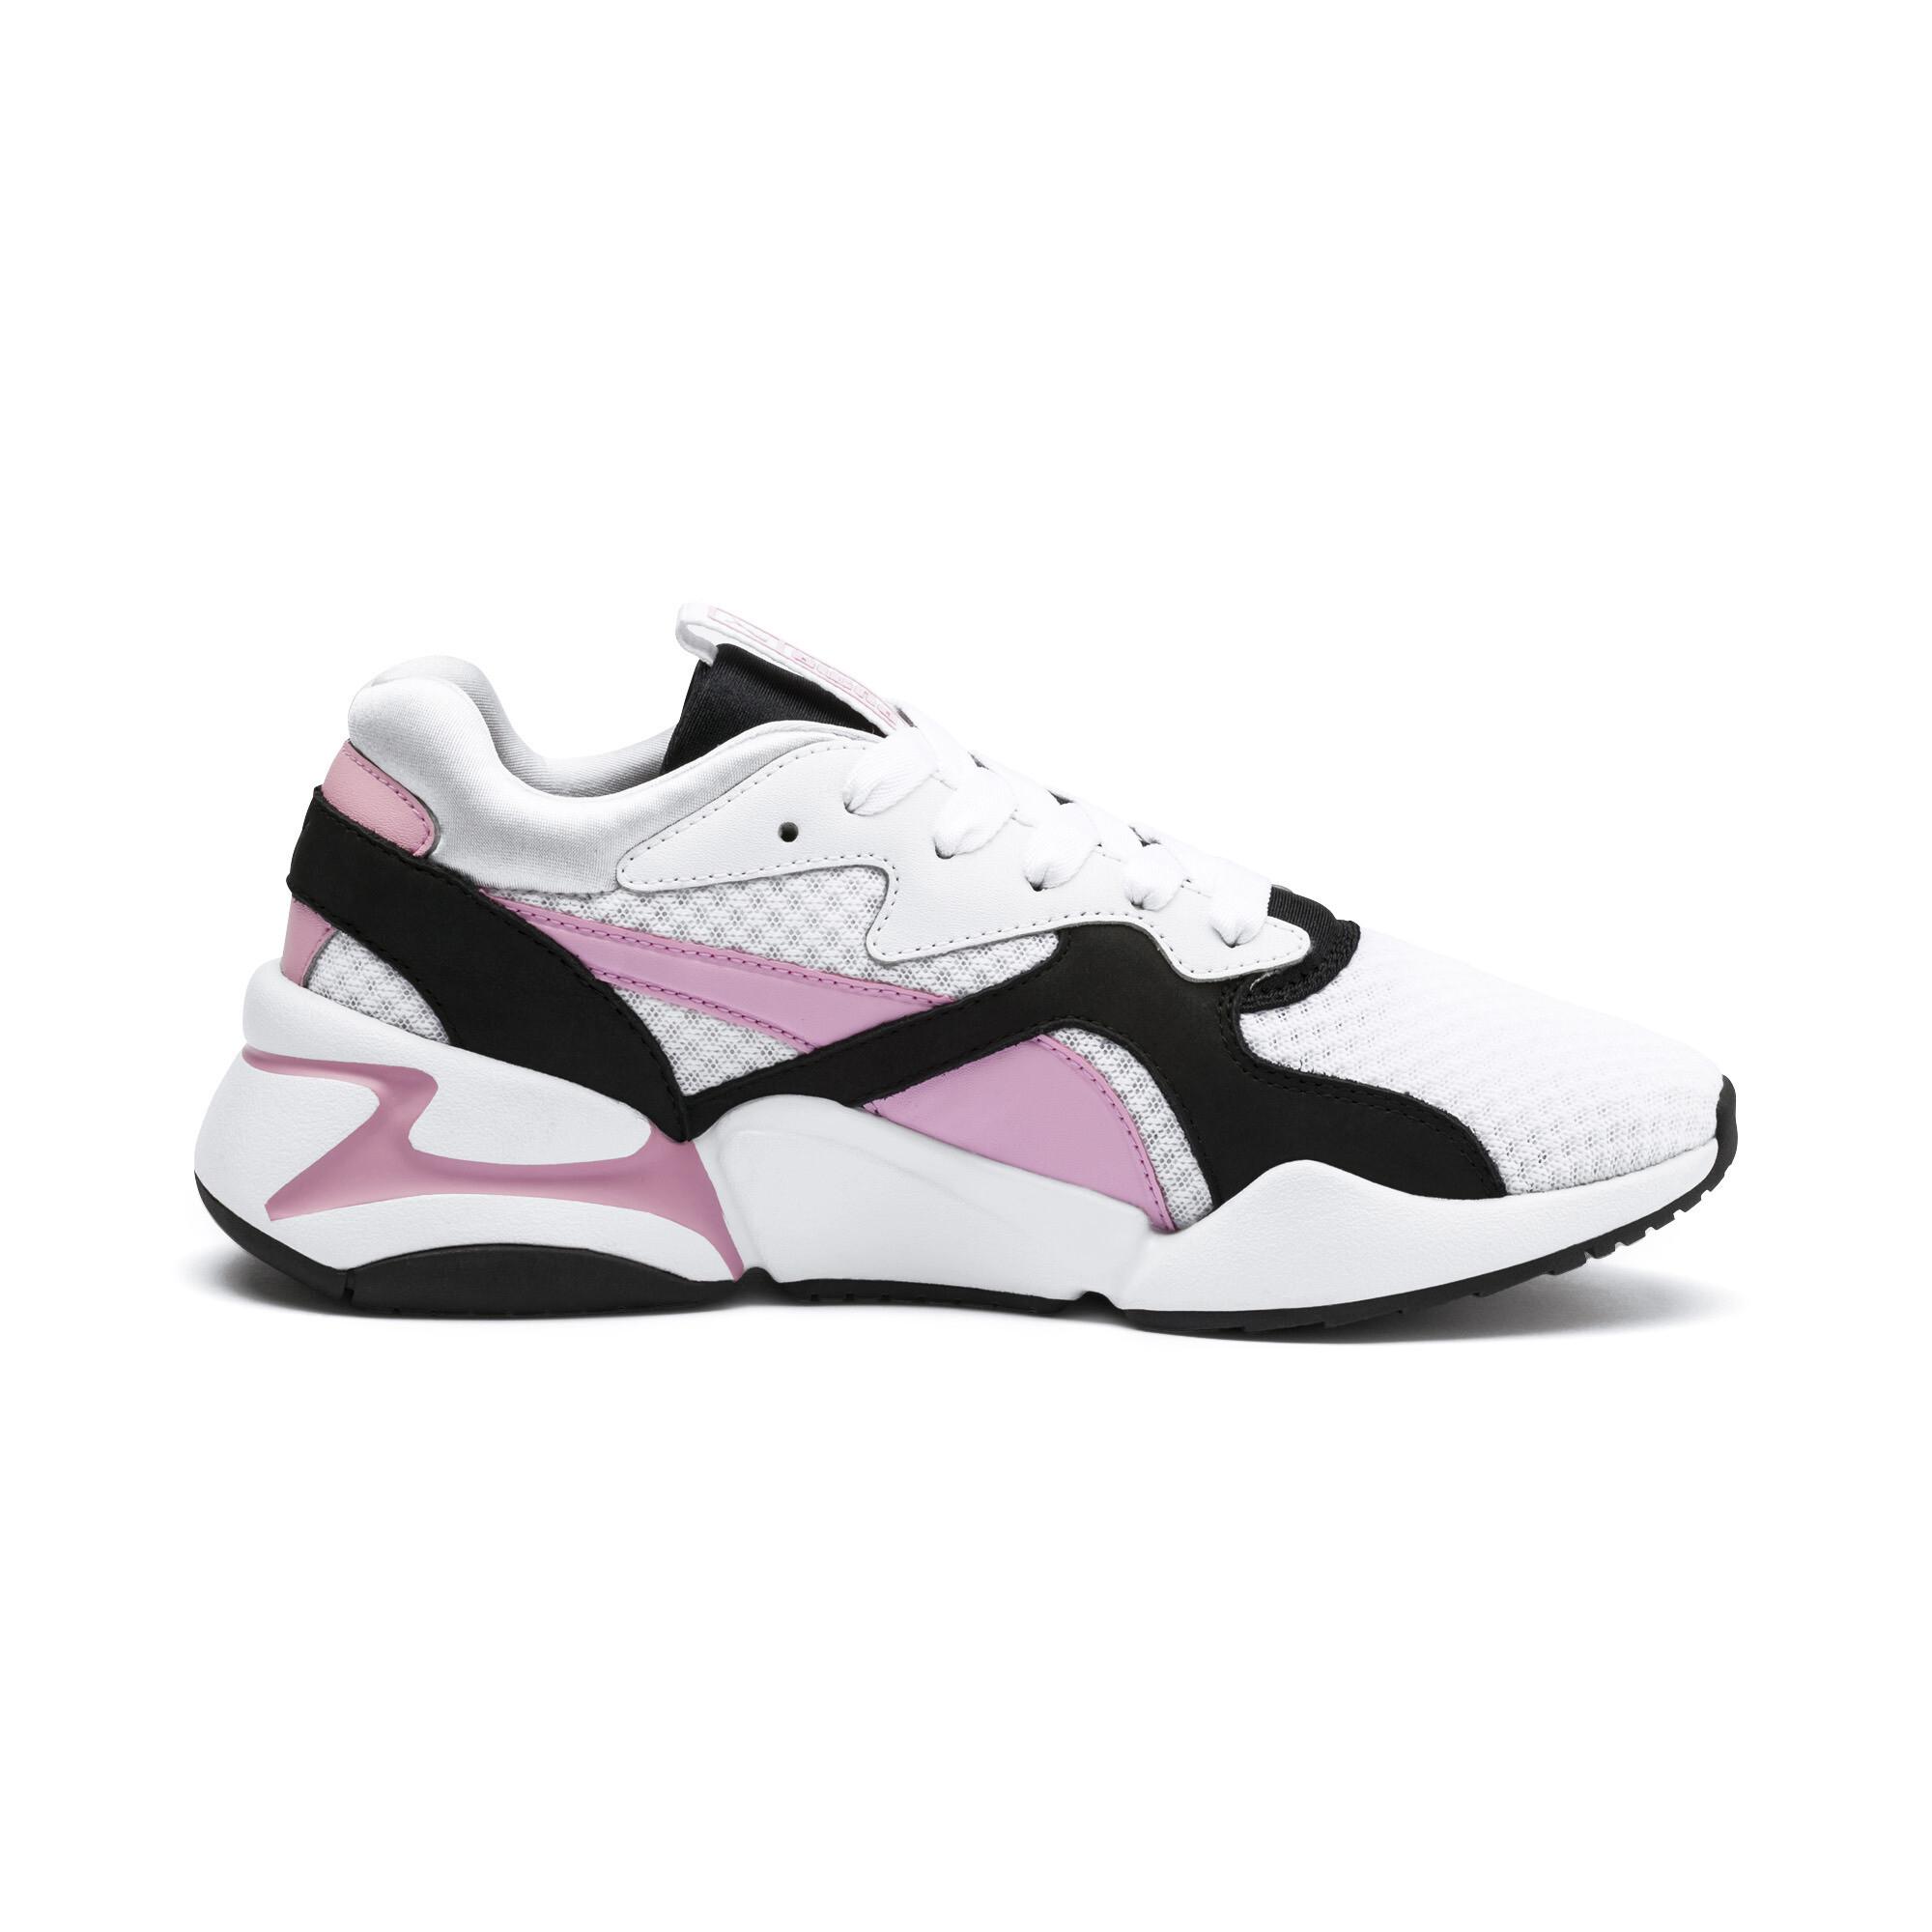 Image Puma Nova '90s Bloc Women's Sneakers #6